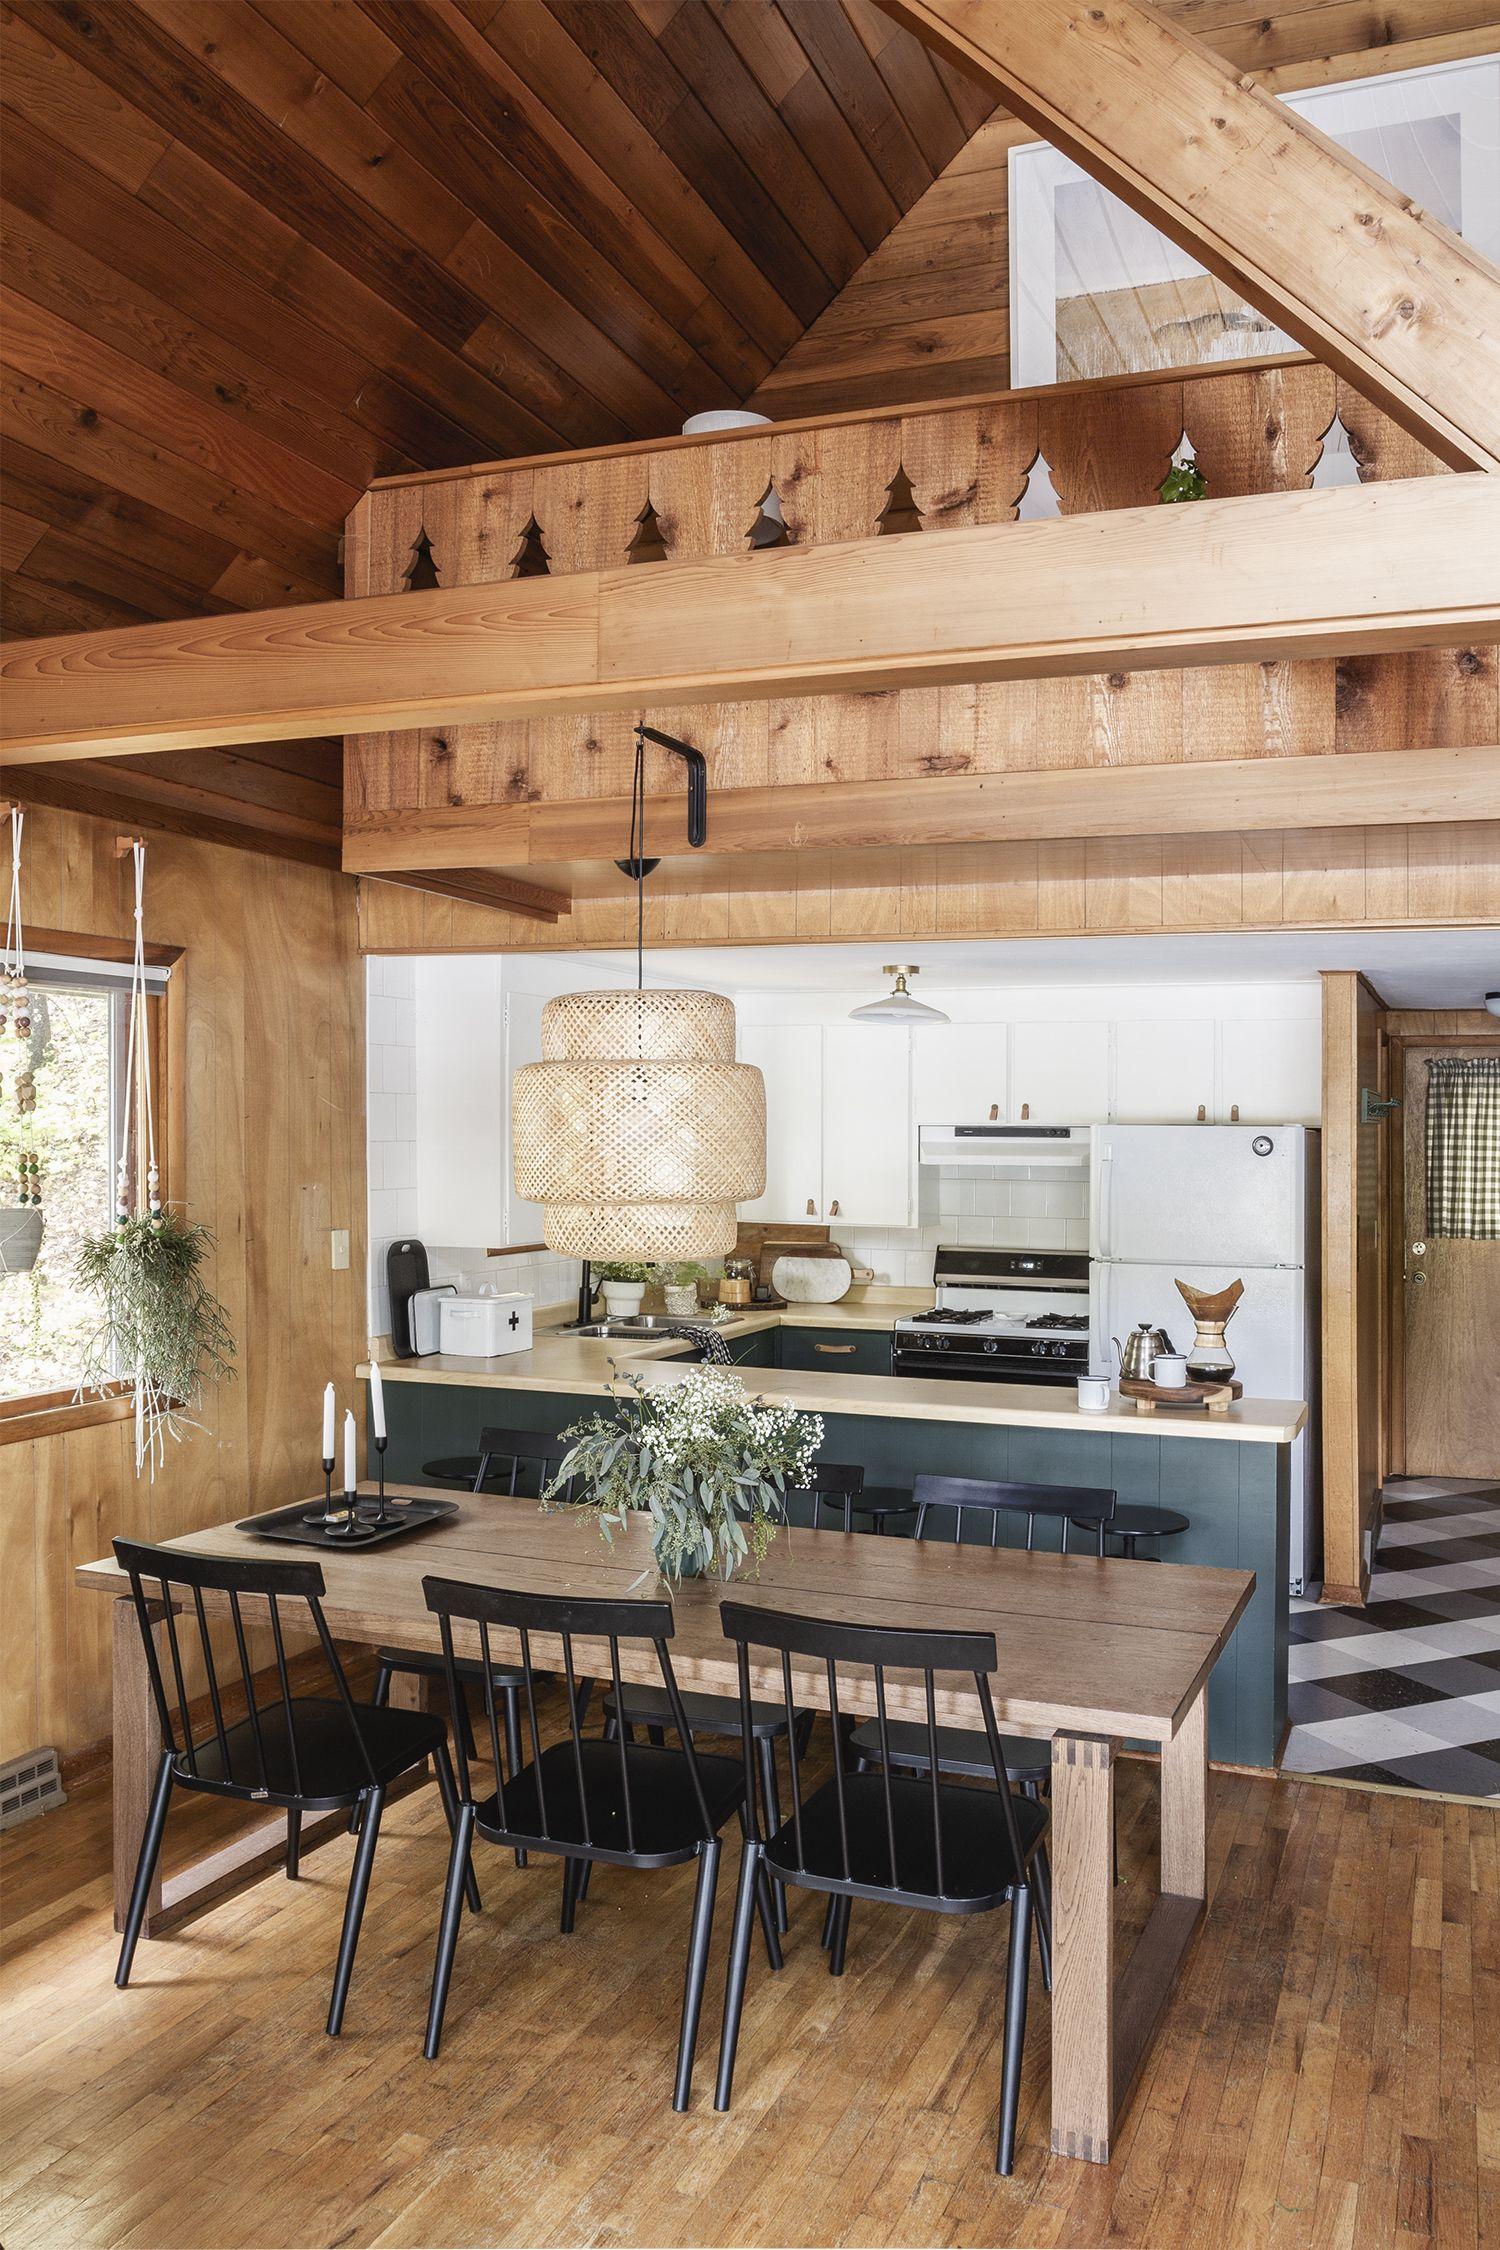 Cabin Kitchen Reveal Small cabin kitchens, Small cabin